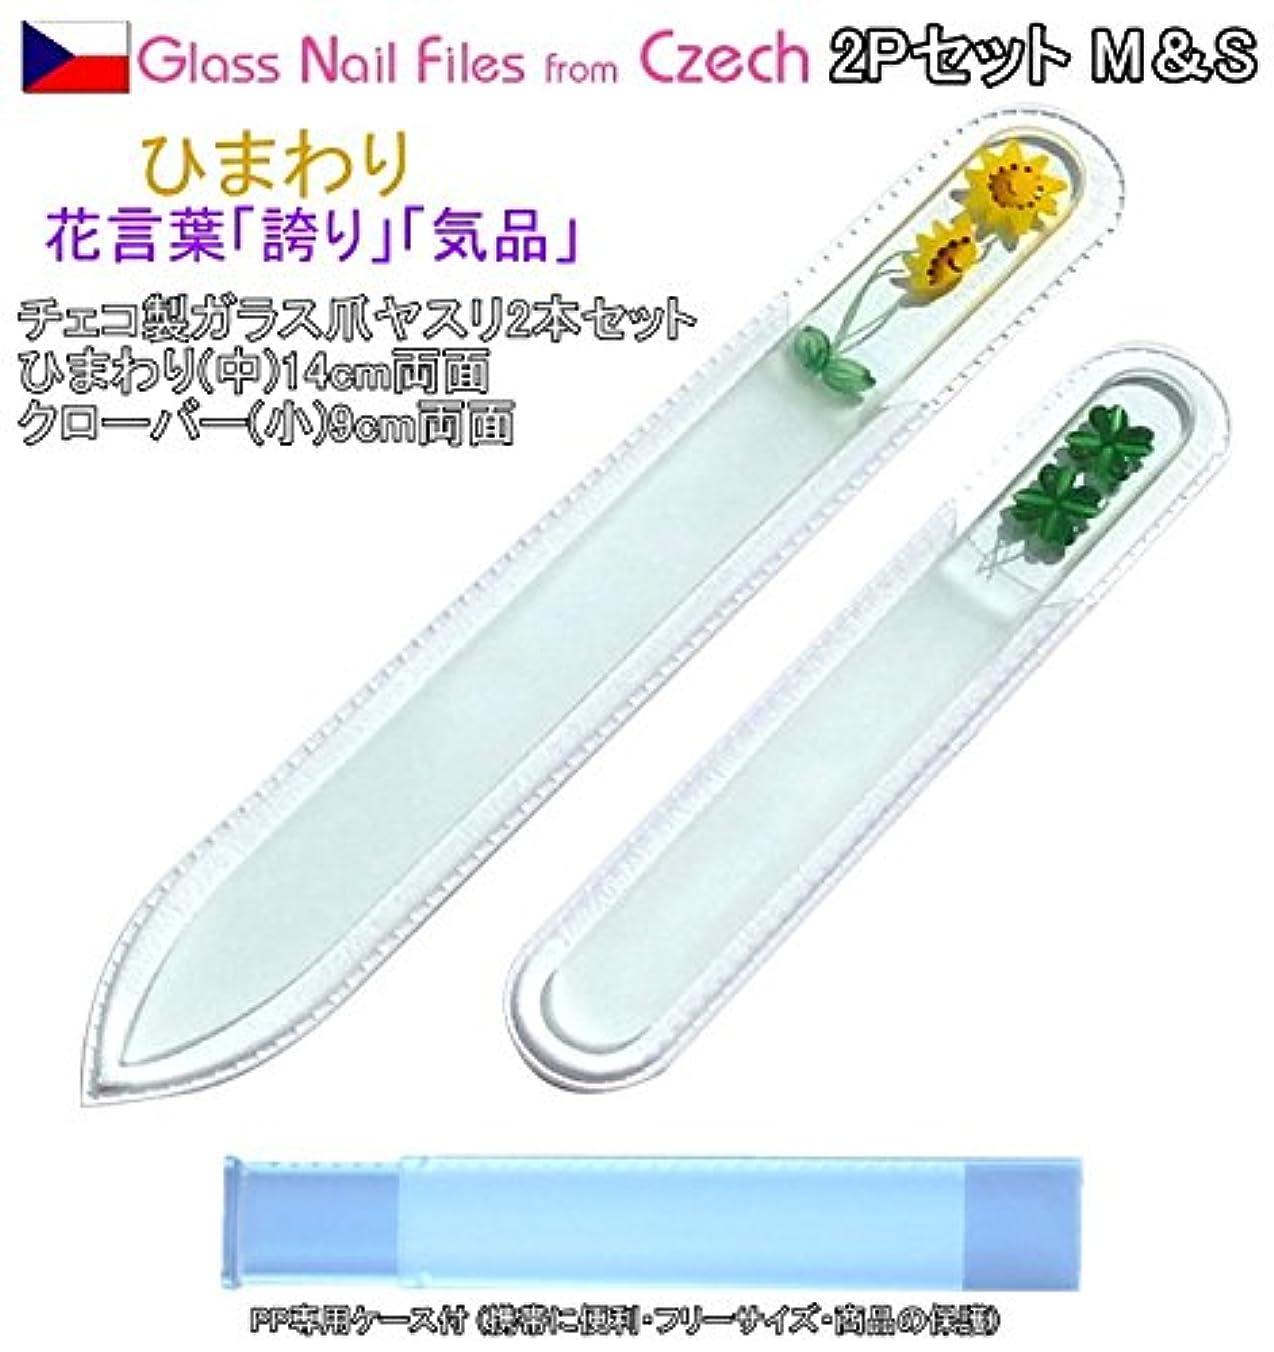 BISON チェコ製ガラス爪ヤスリ ひまわり 2本セット 14cm&9cm ミニクローバー 両面仕上げ 専用ケース付